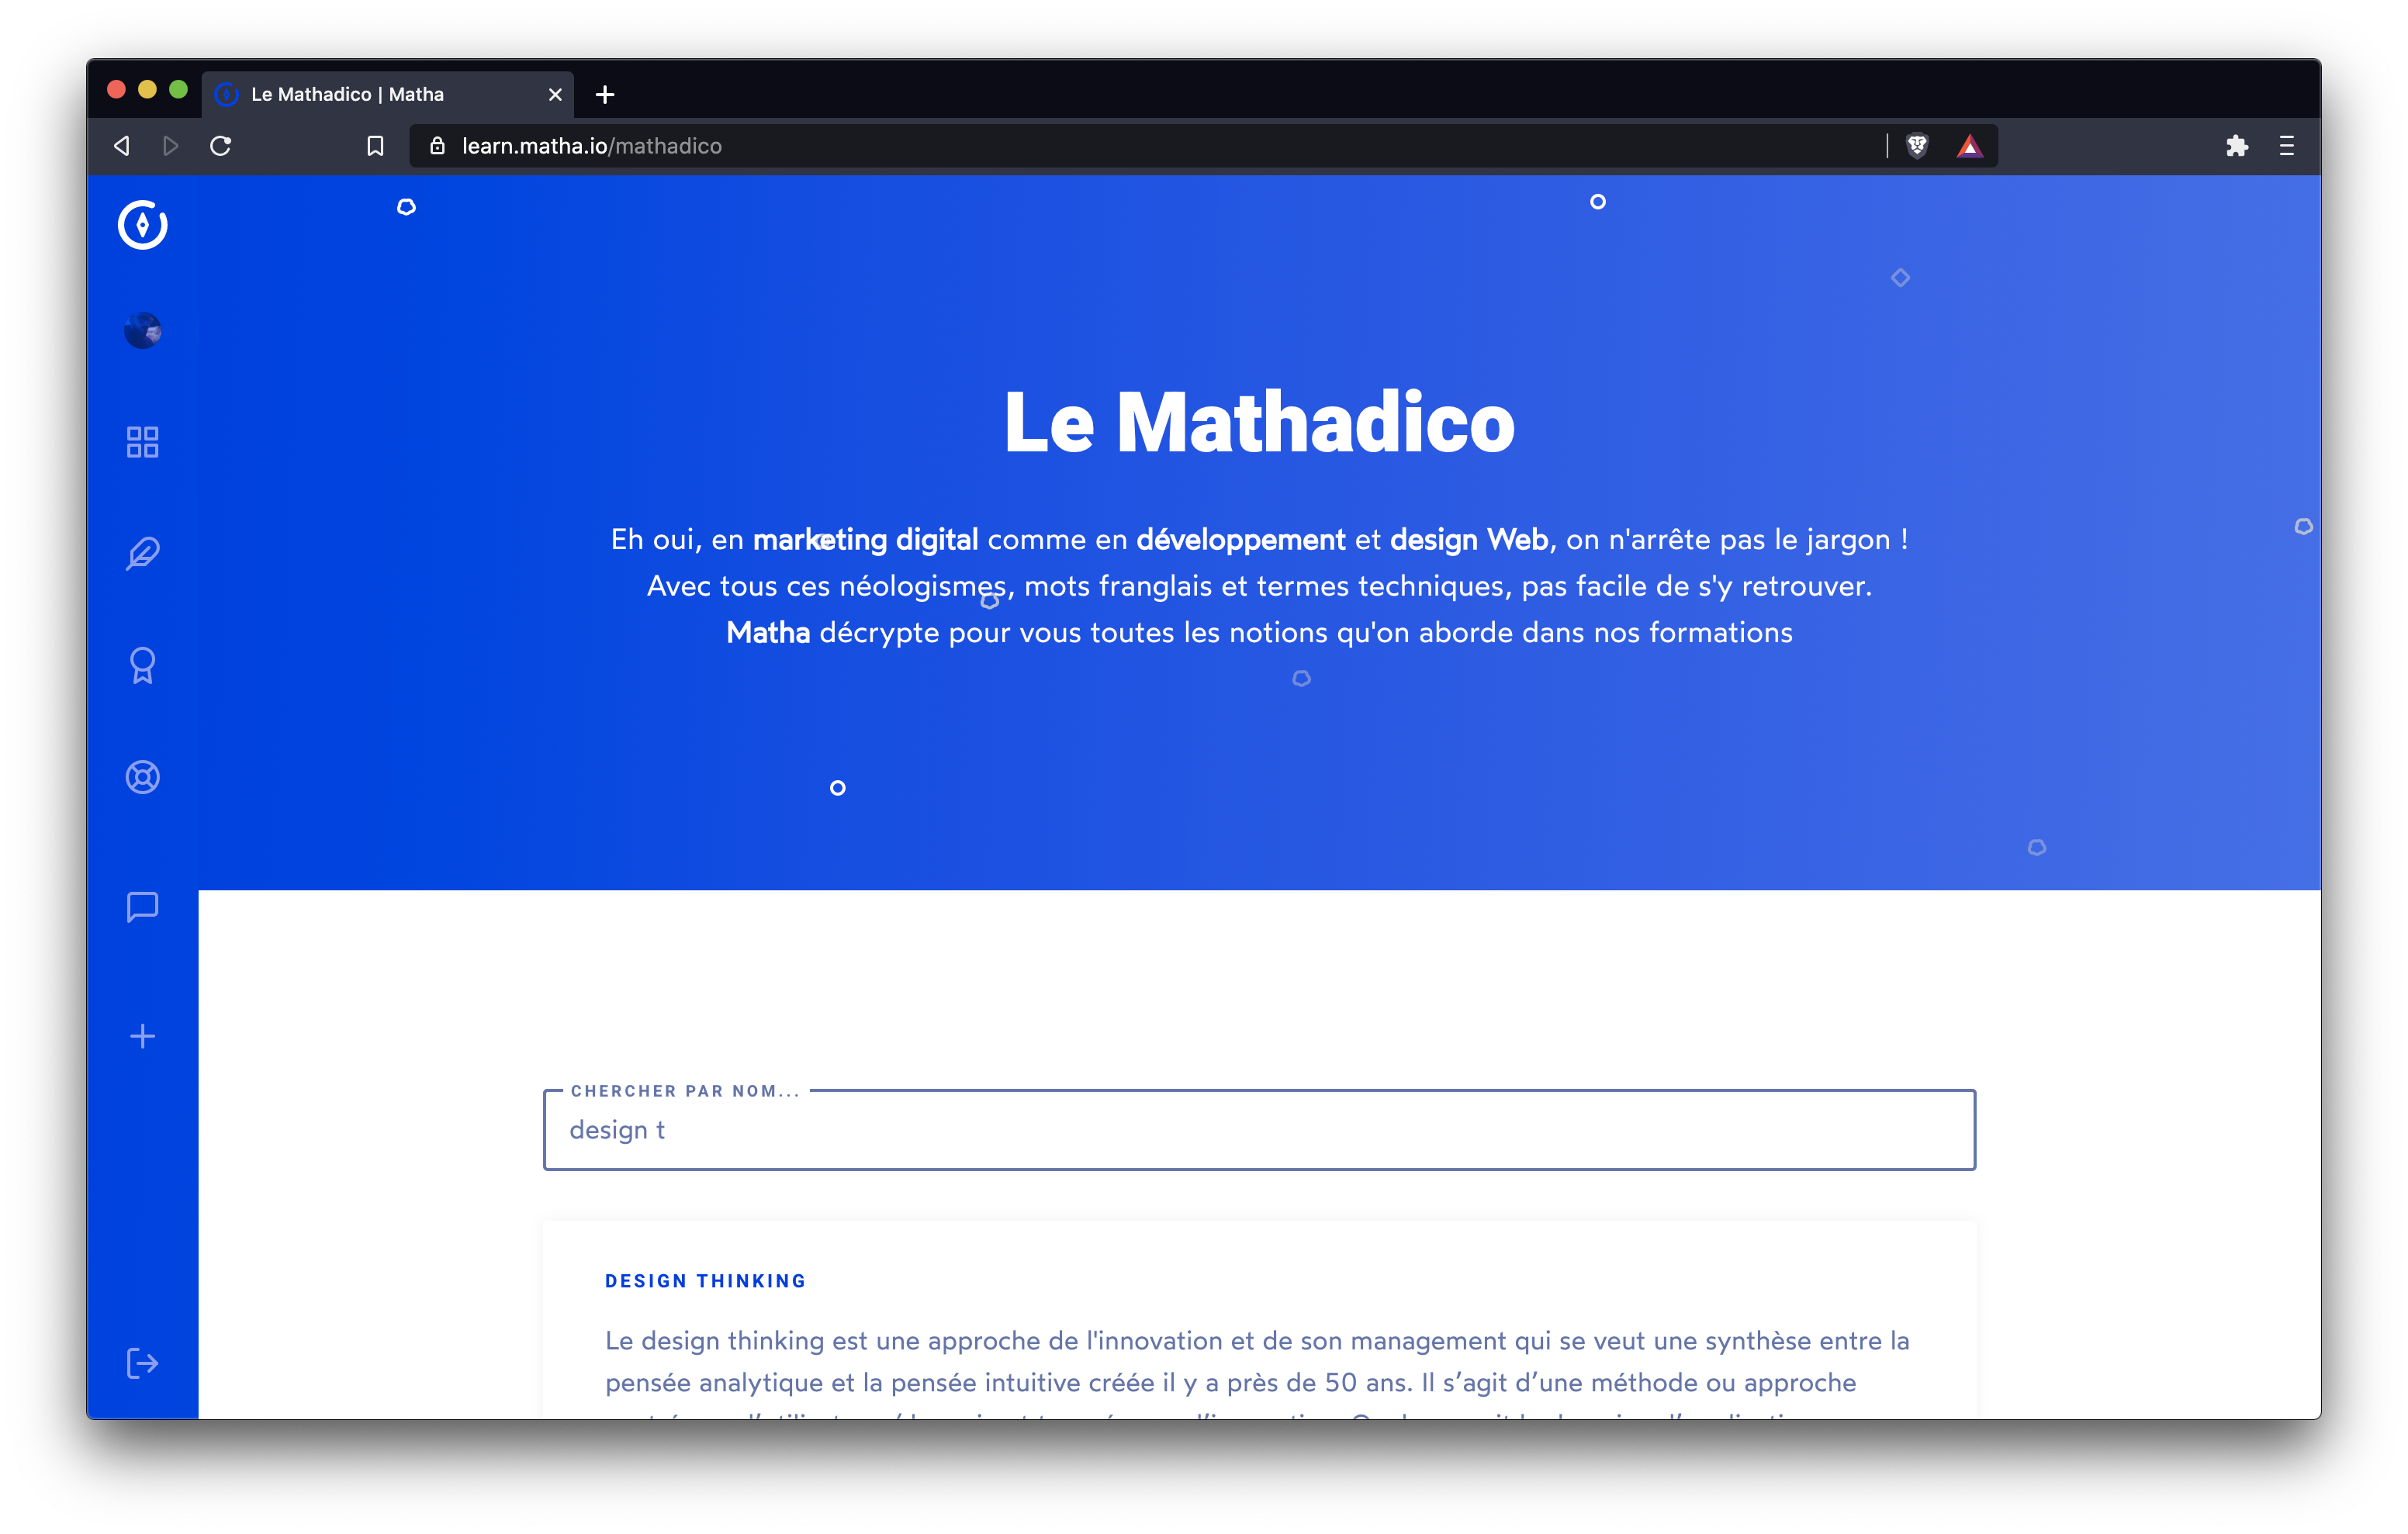 👩🏫 Le Mathadico